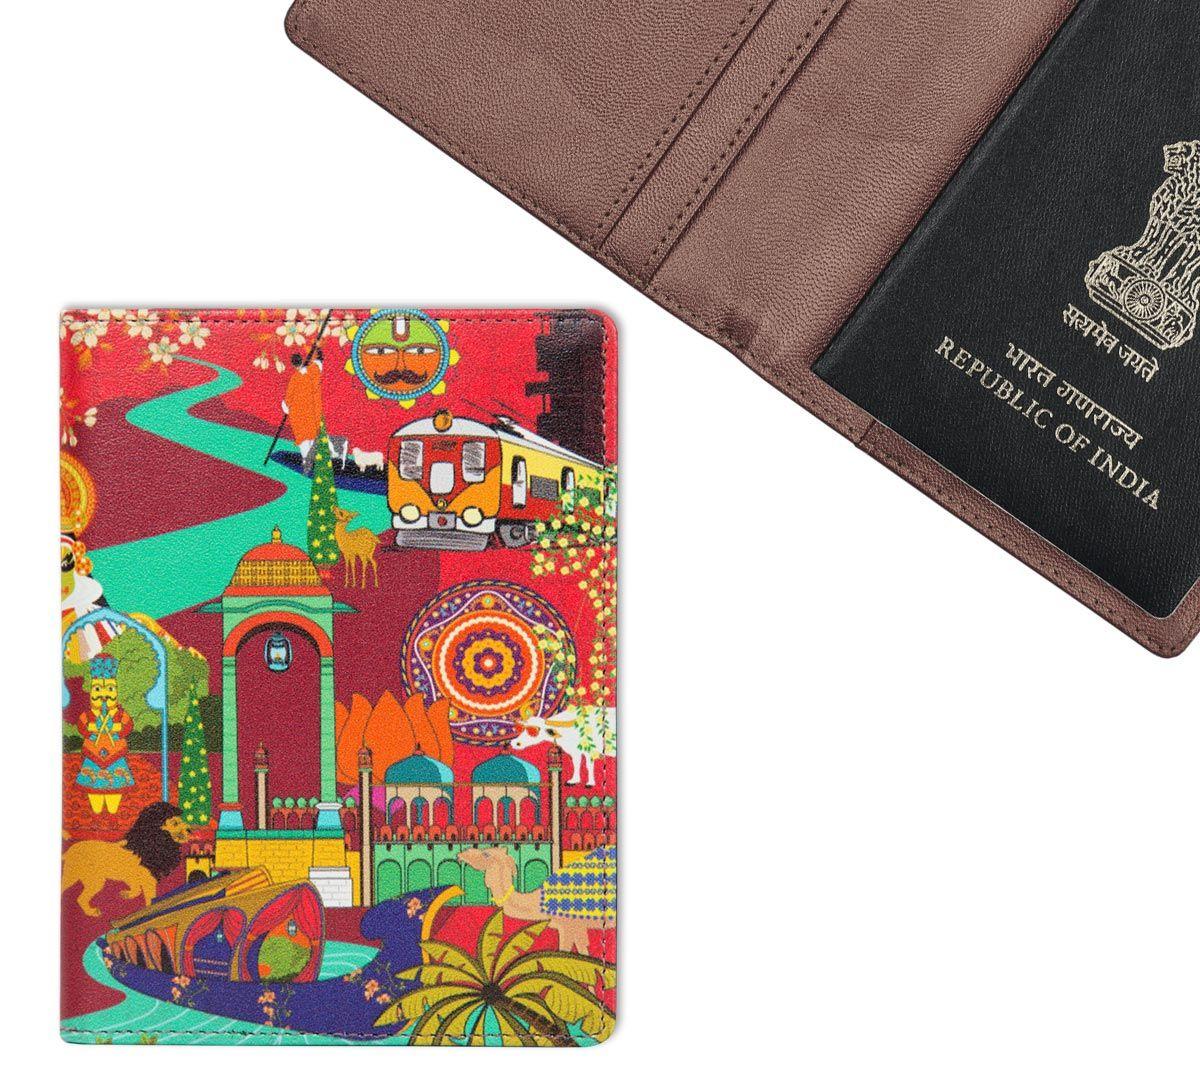 Bedlam Dramatics Passport Cover